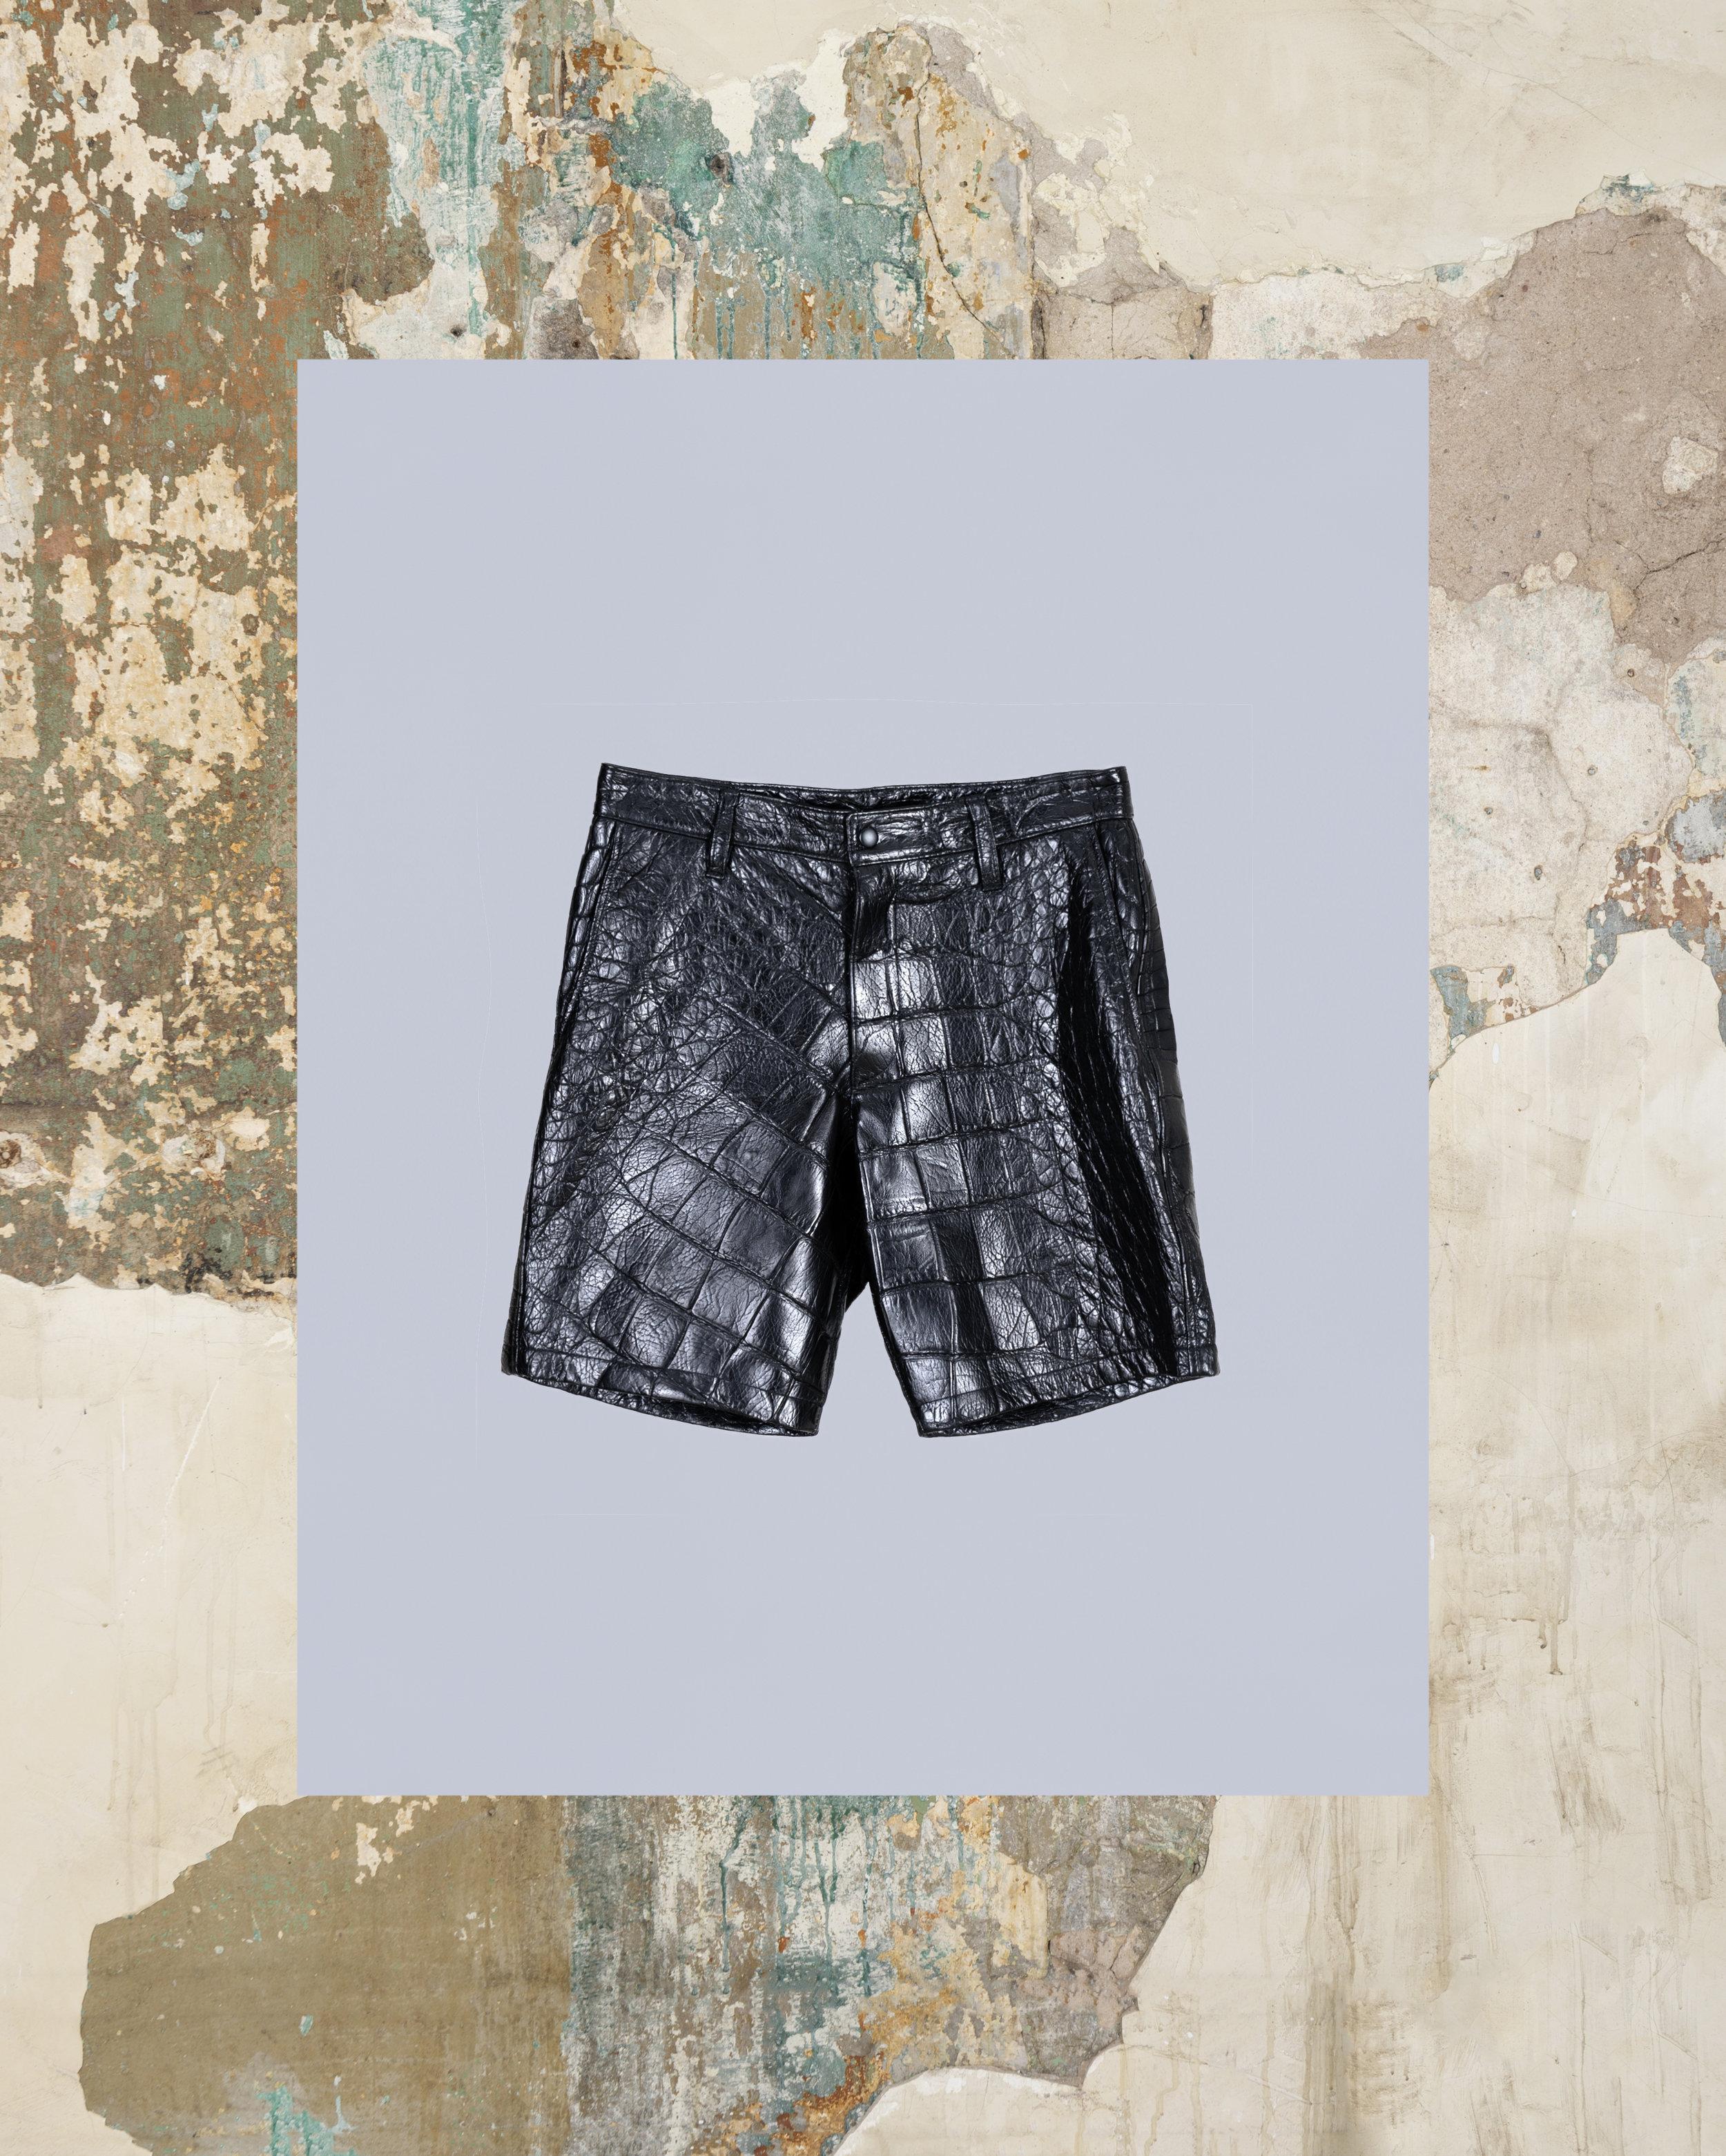 Gator_shorts_front.jpg